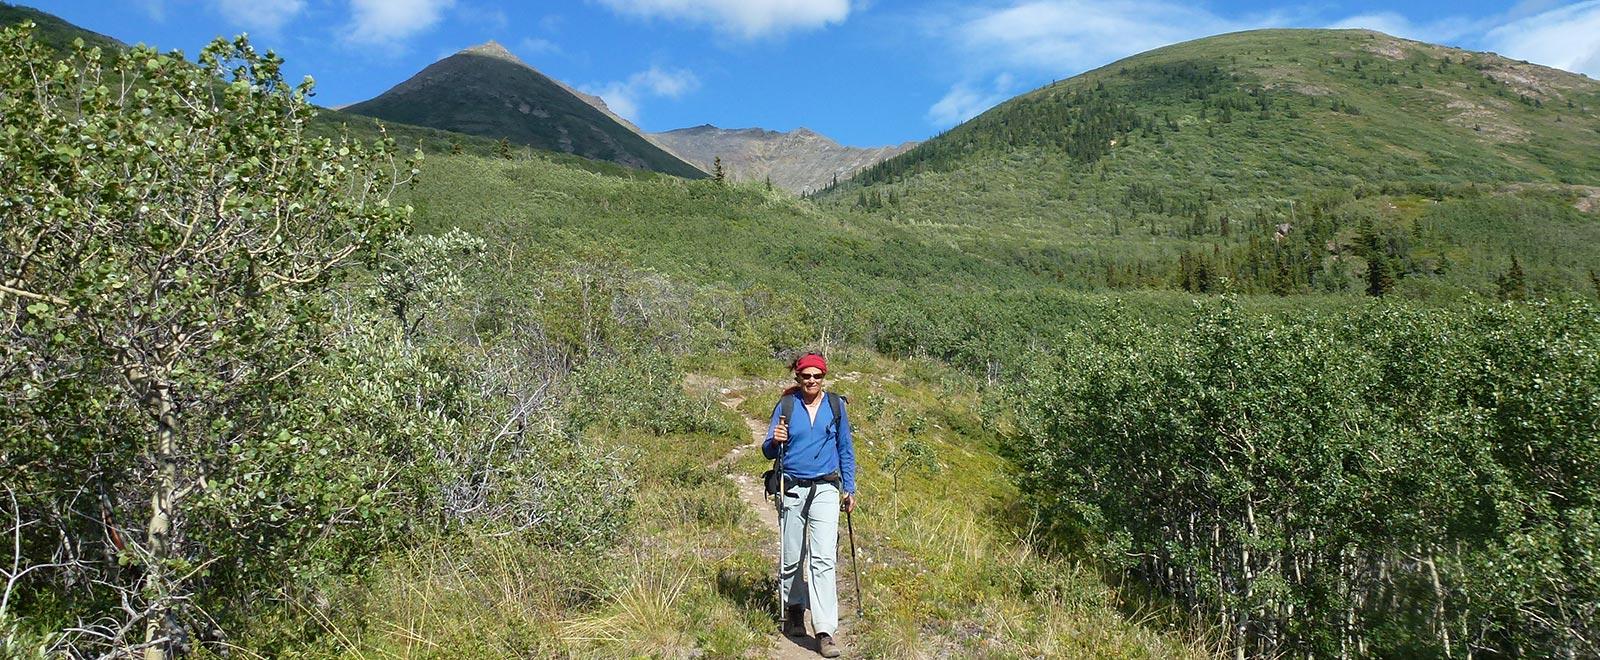 hiking-yukon-scenery-slide